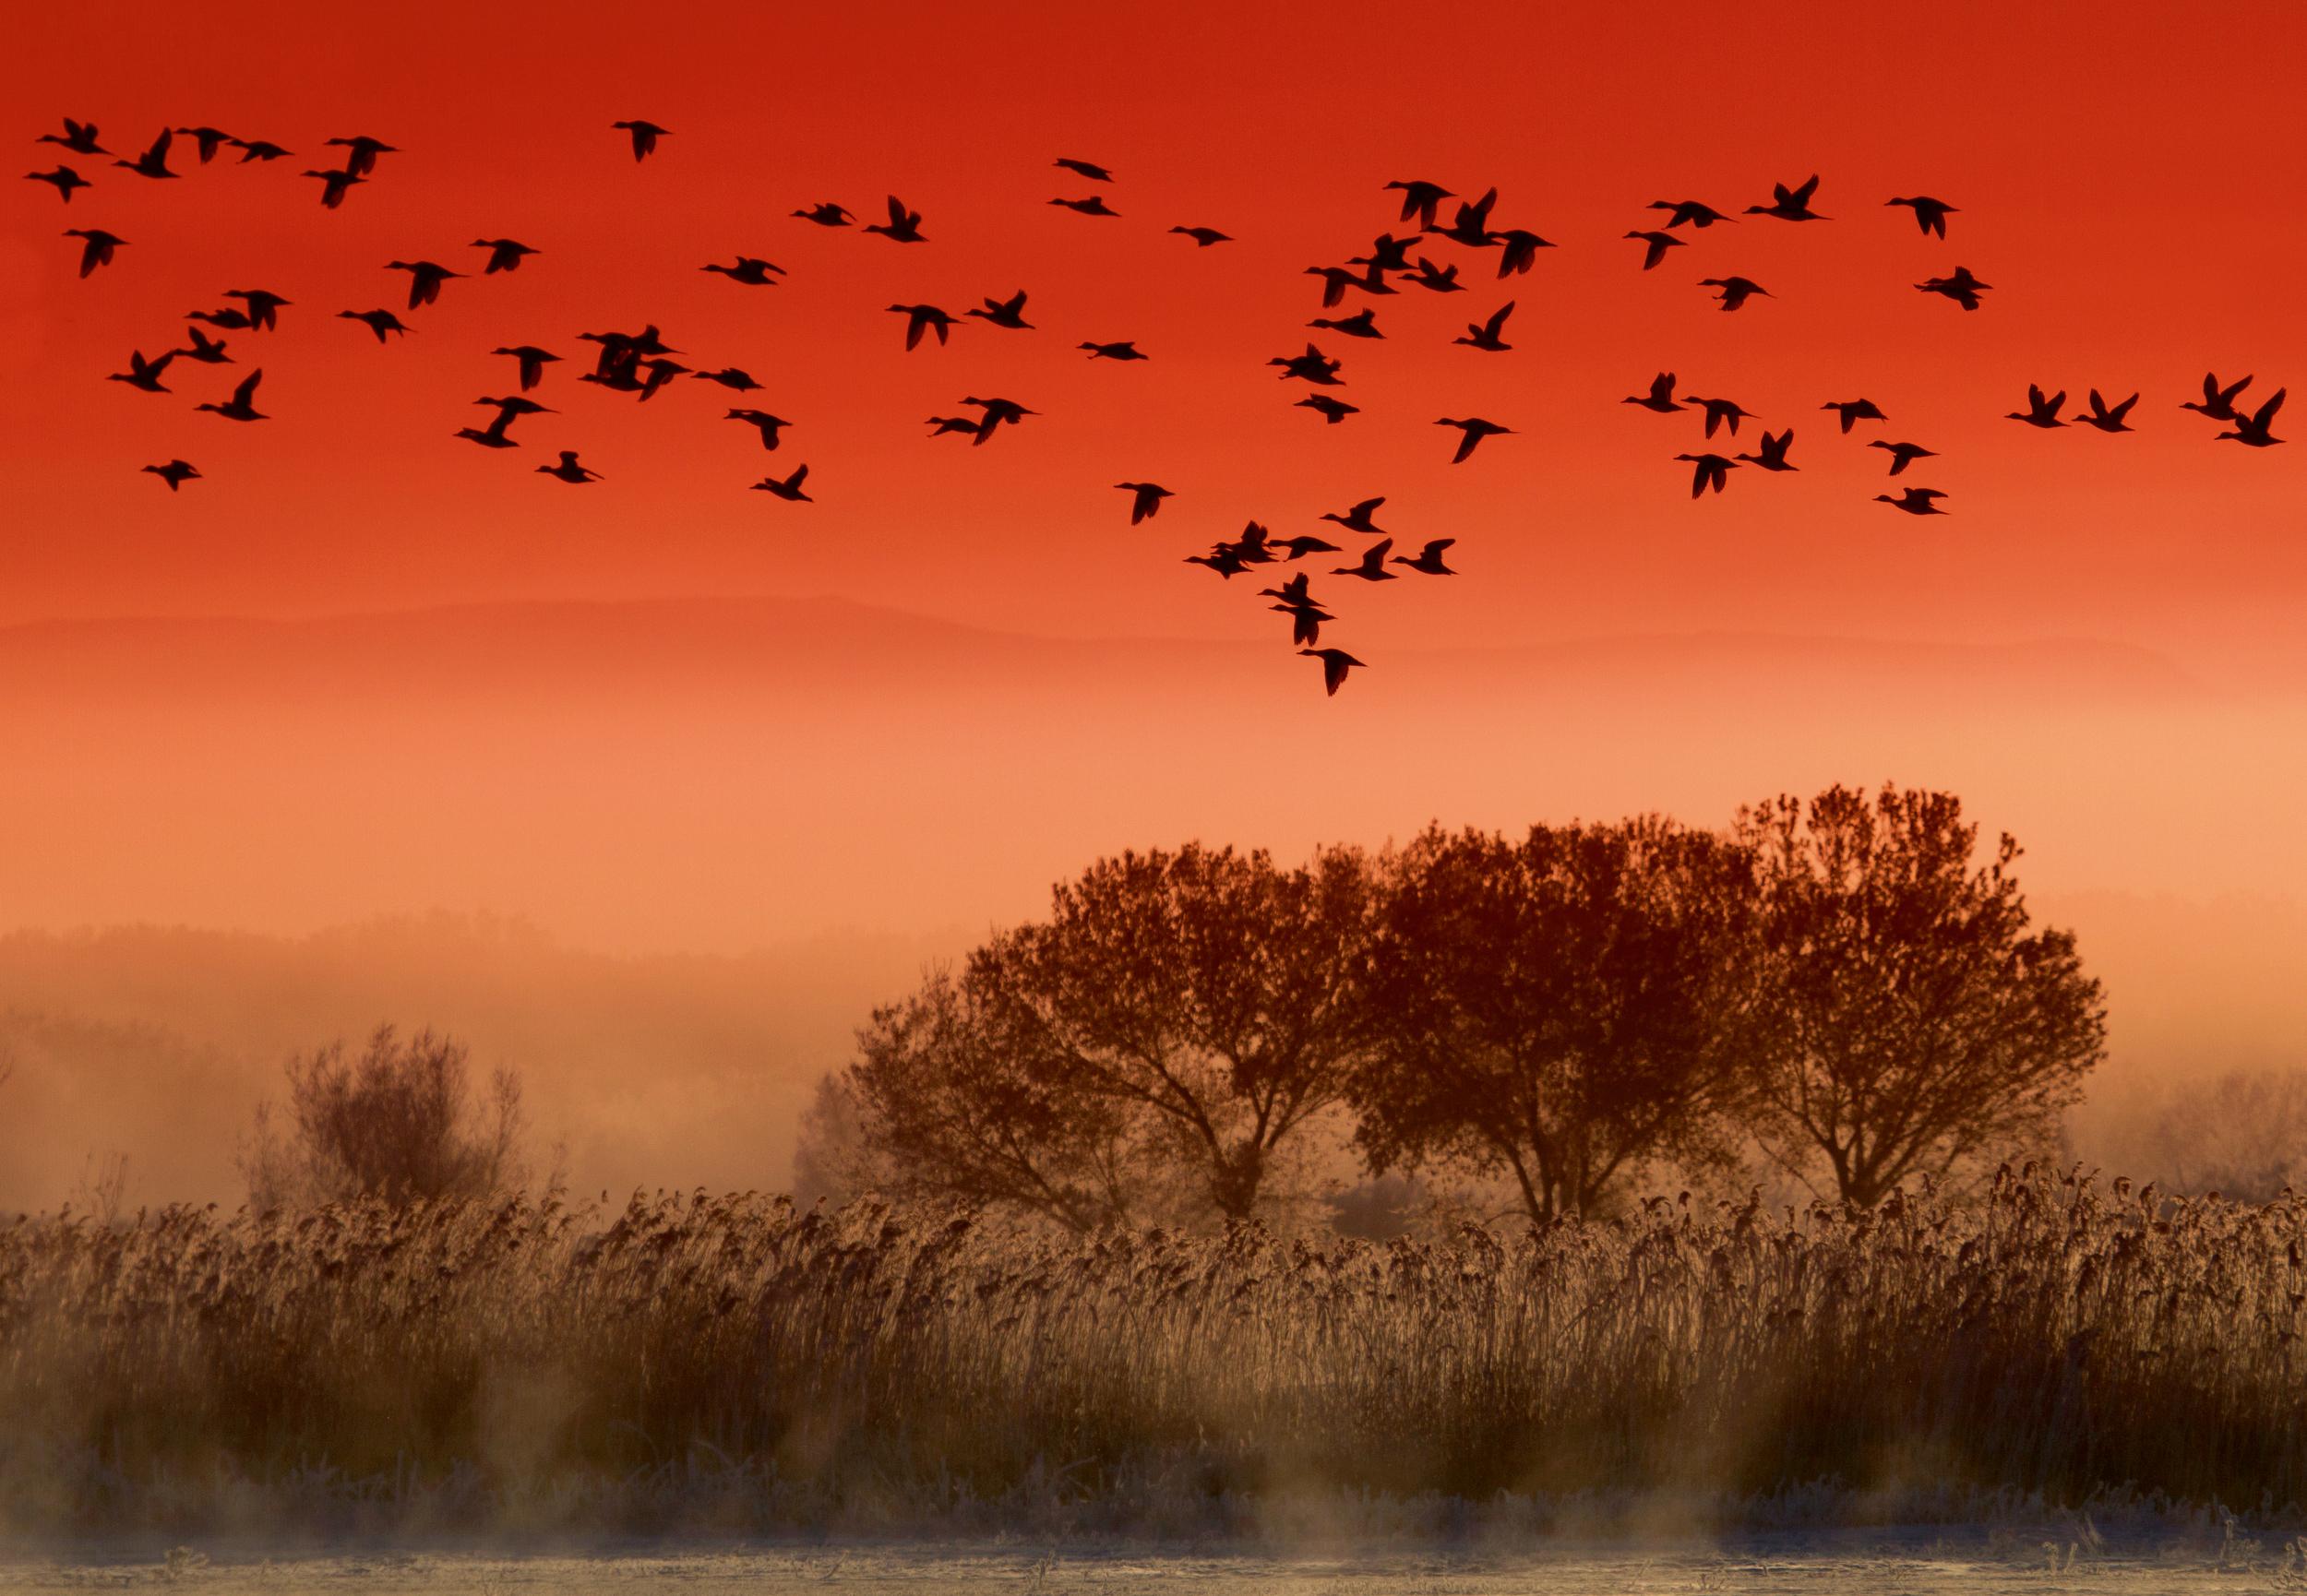 Rick Sammon's Birds011.jpg